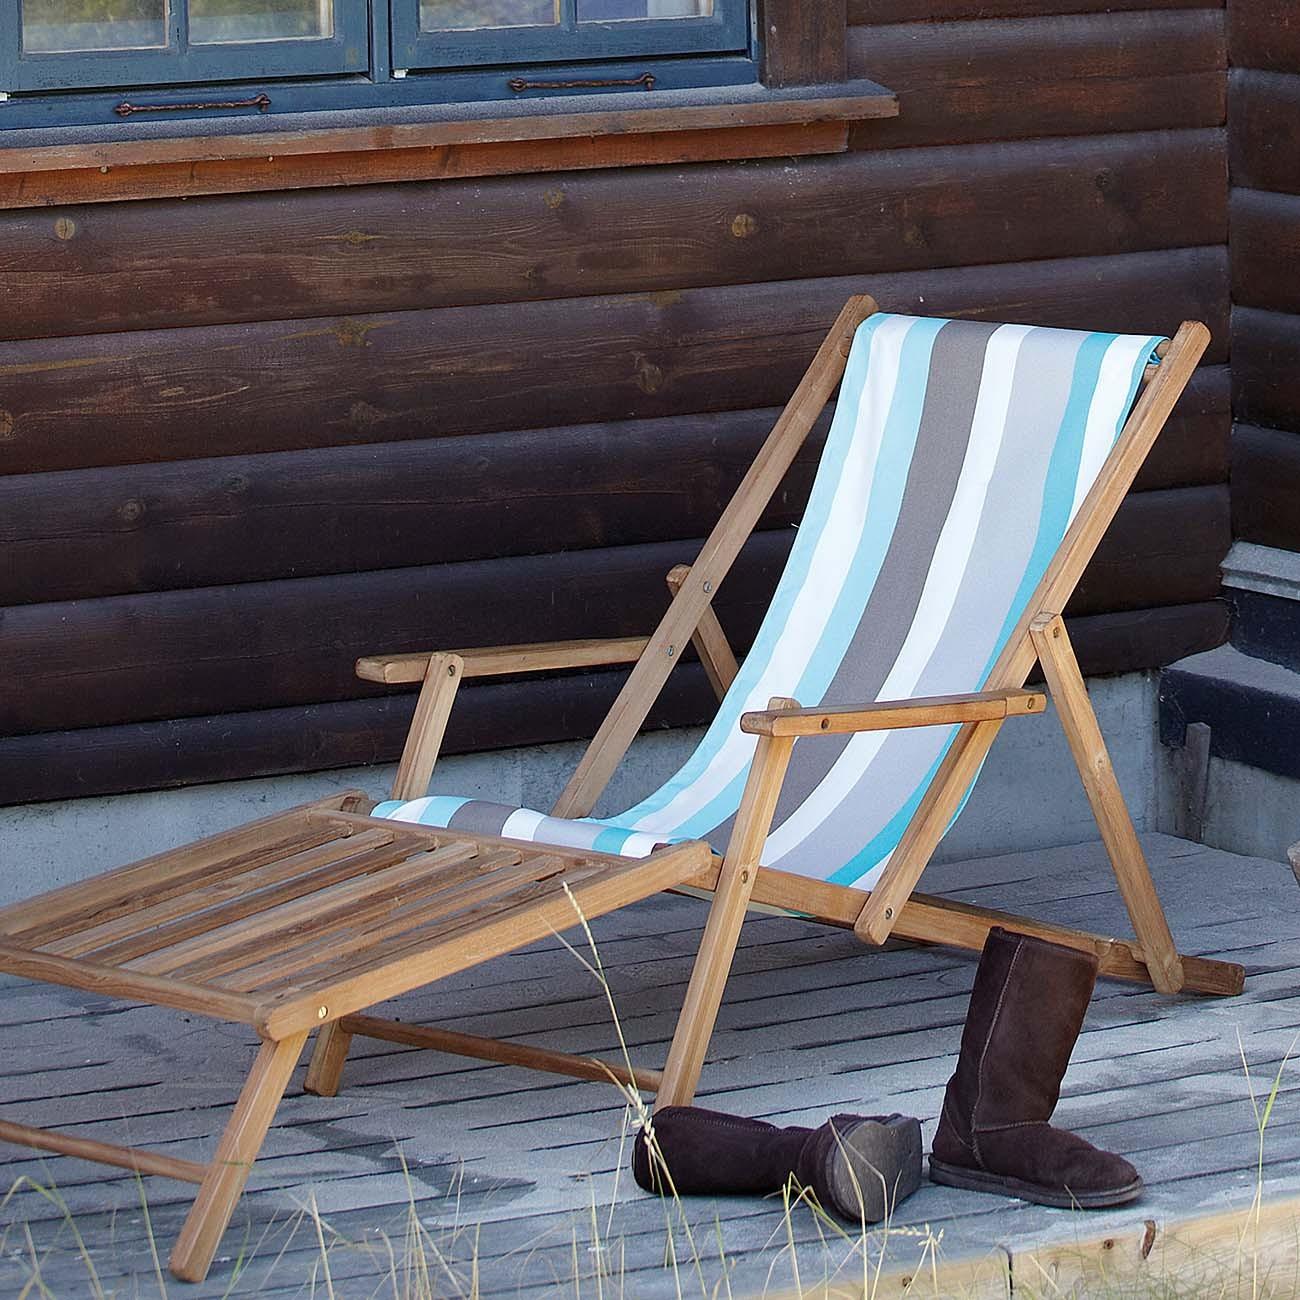 jan kurtz fu teil holz f r deckchair bzw strandstuhl ohne stuhl ebay. Black Bedroom Furniture Sets. Home Design Ideas